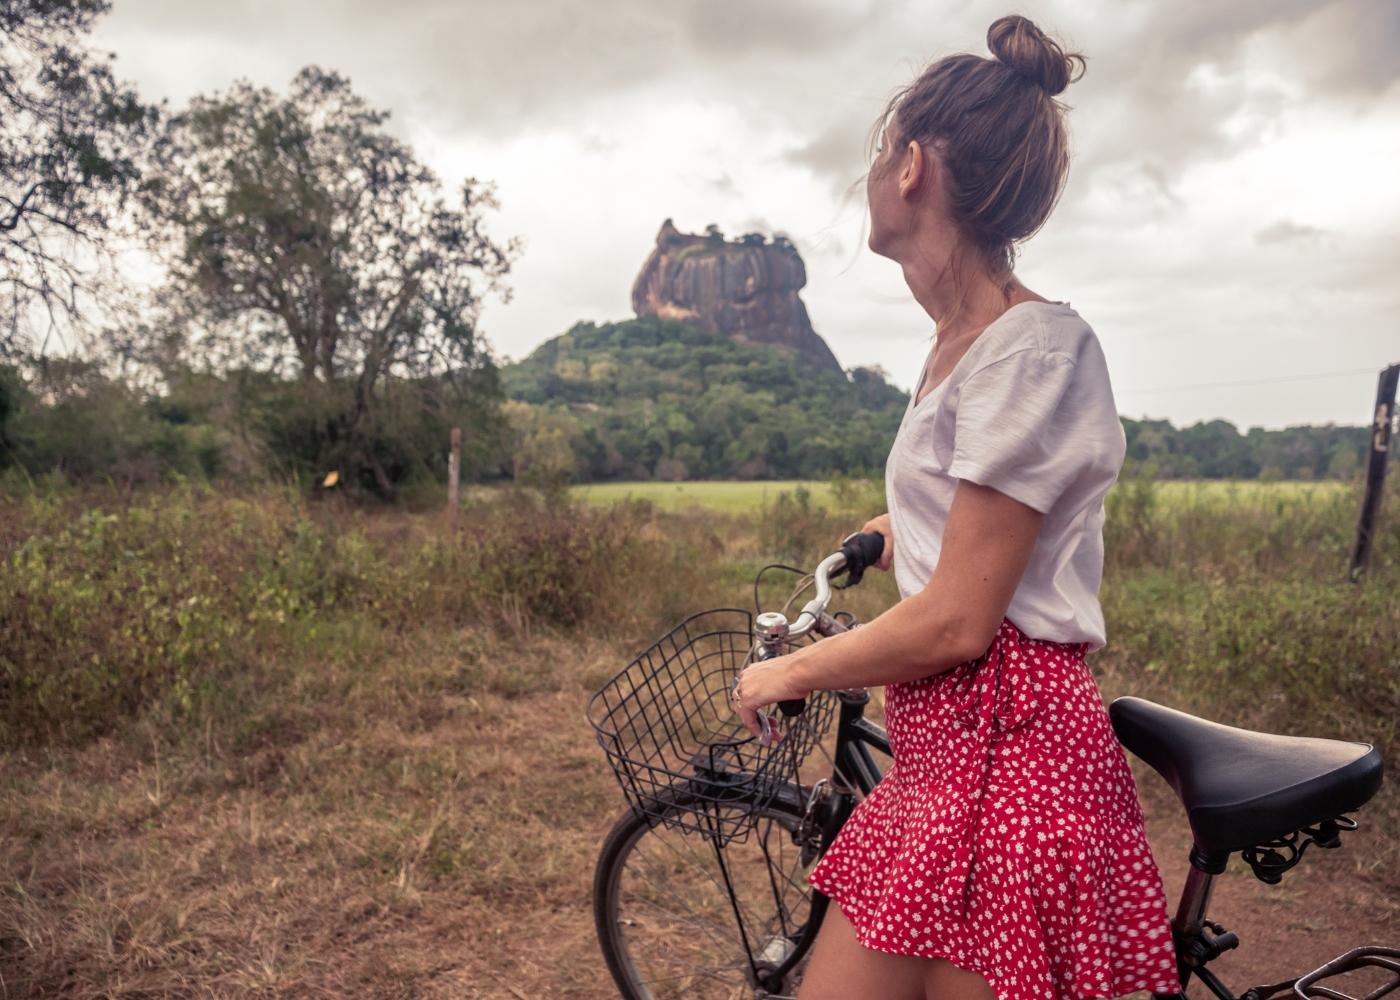 jovem a apreciar a natureza de bicicleta